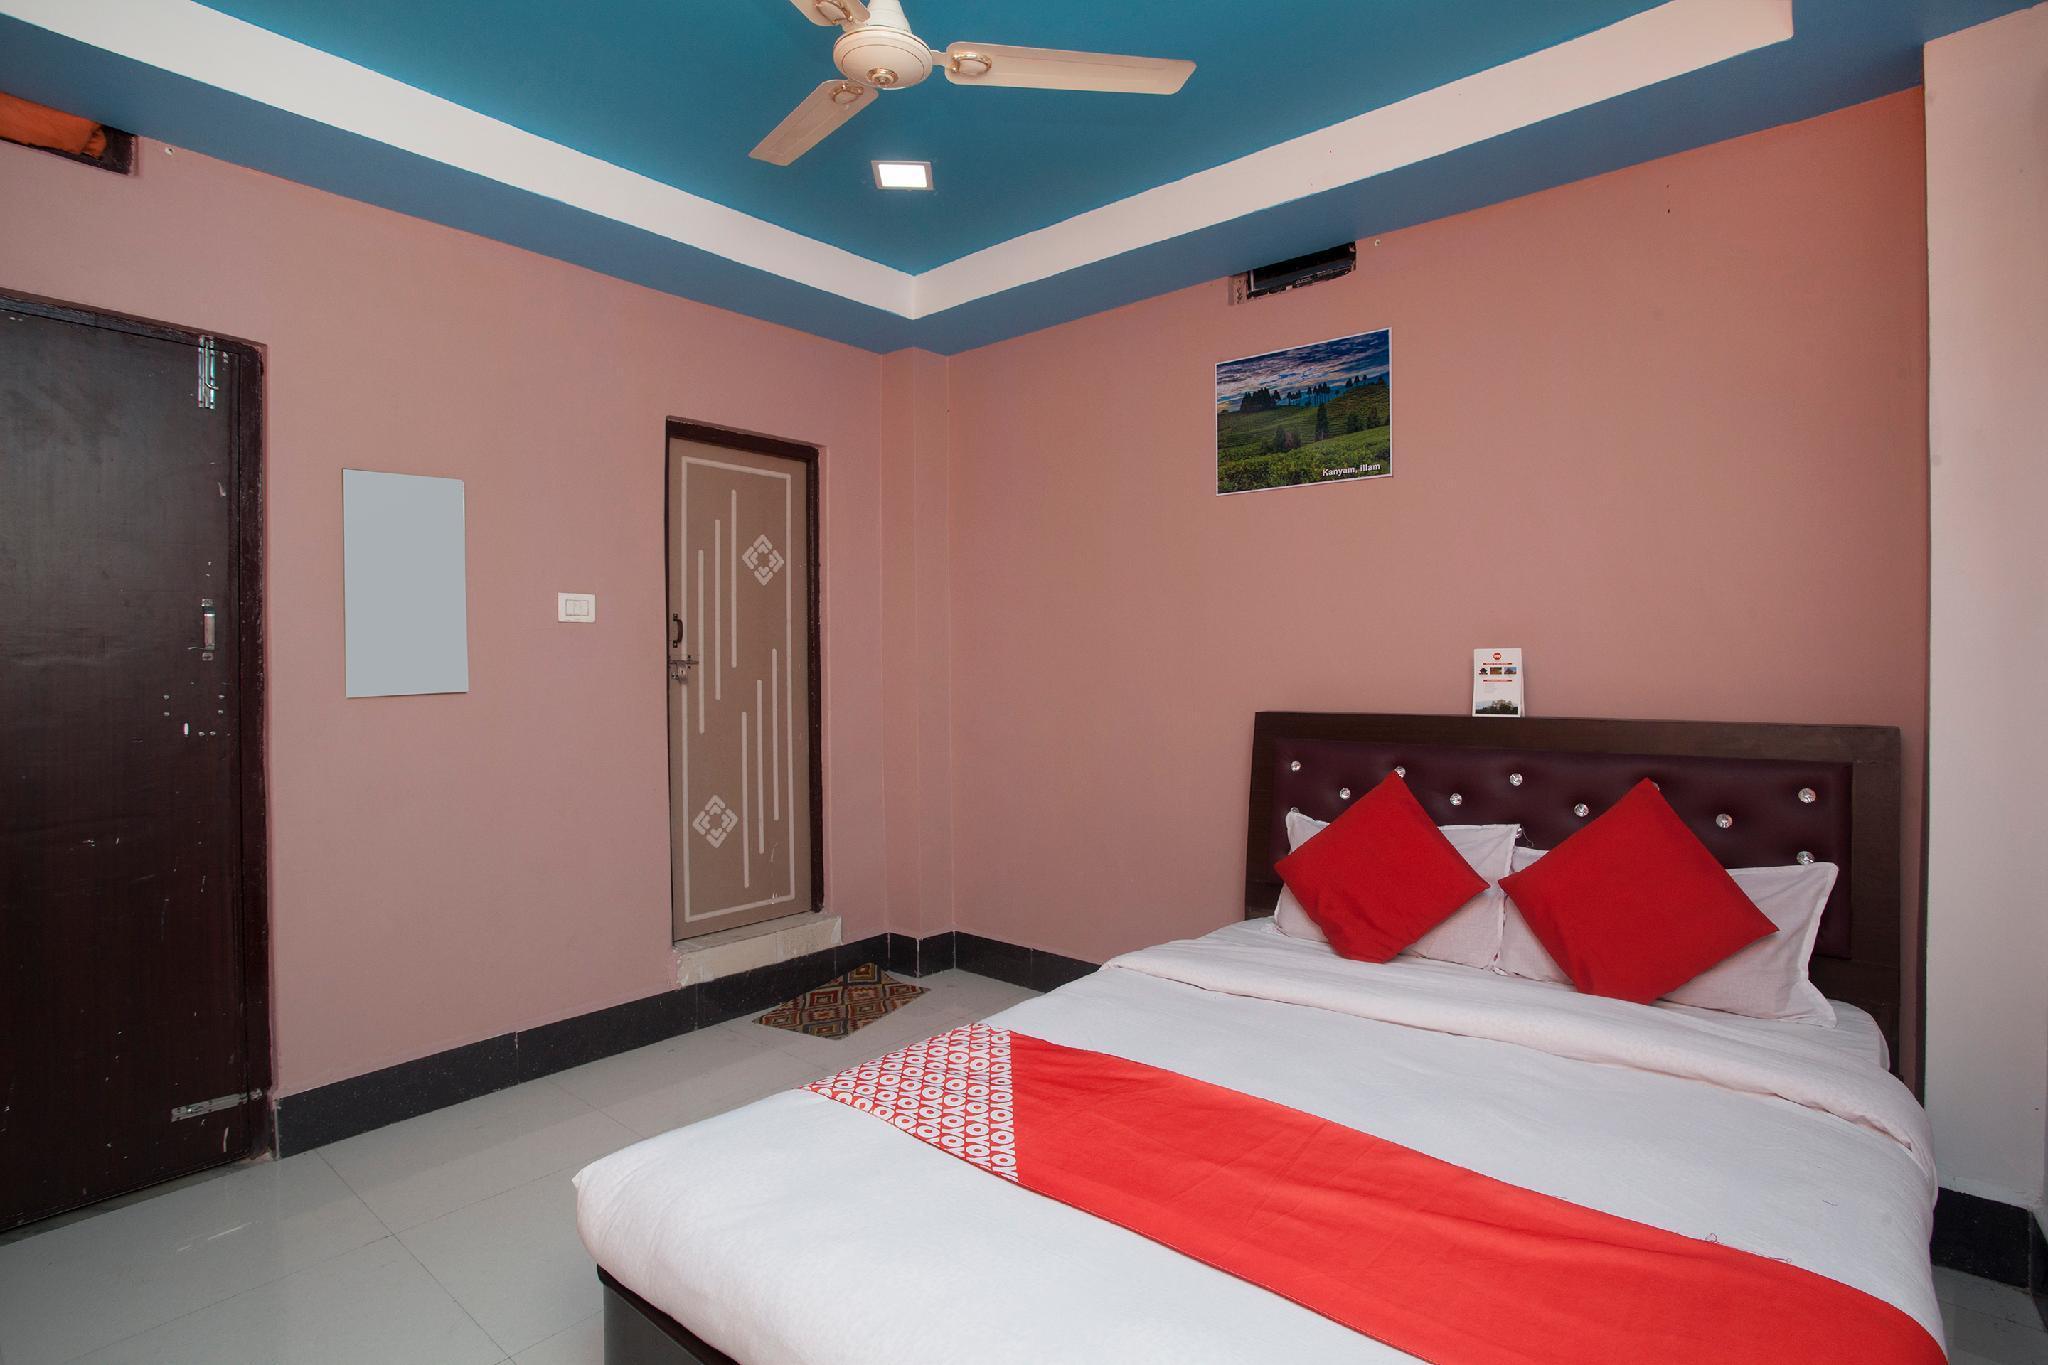 OYO 646 Hotel 7 Ocean And Lodge, Mechi